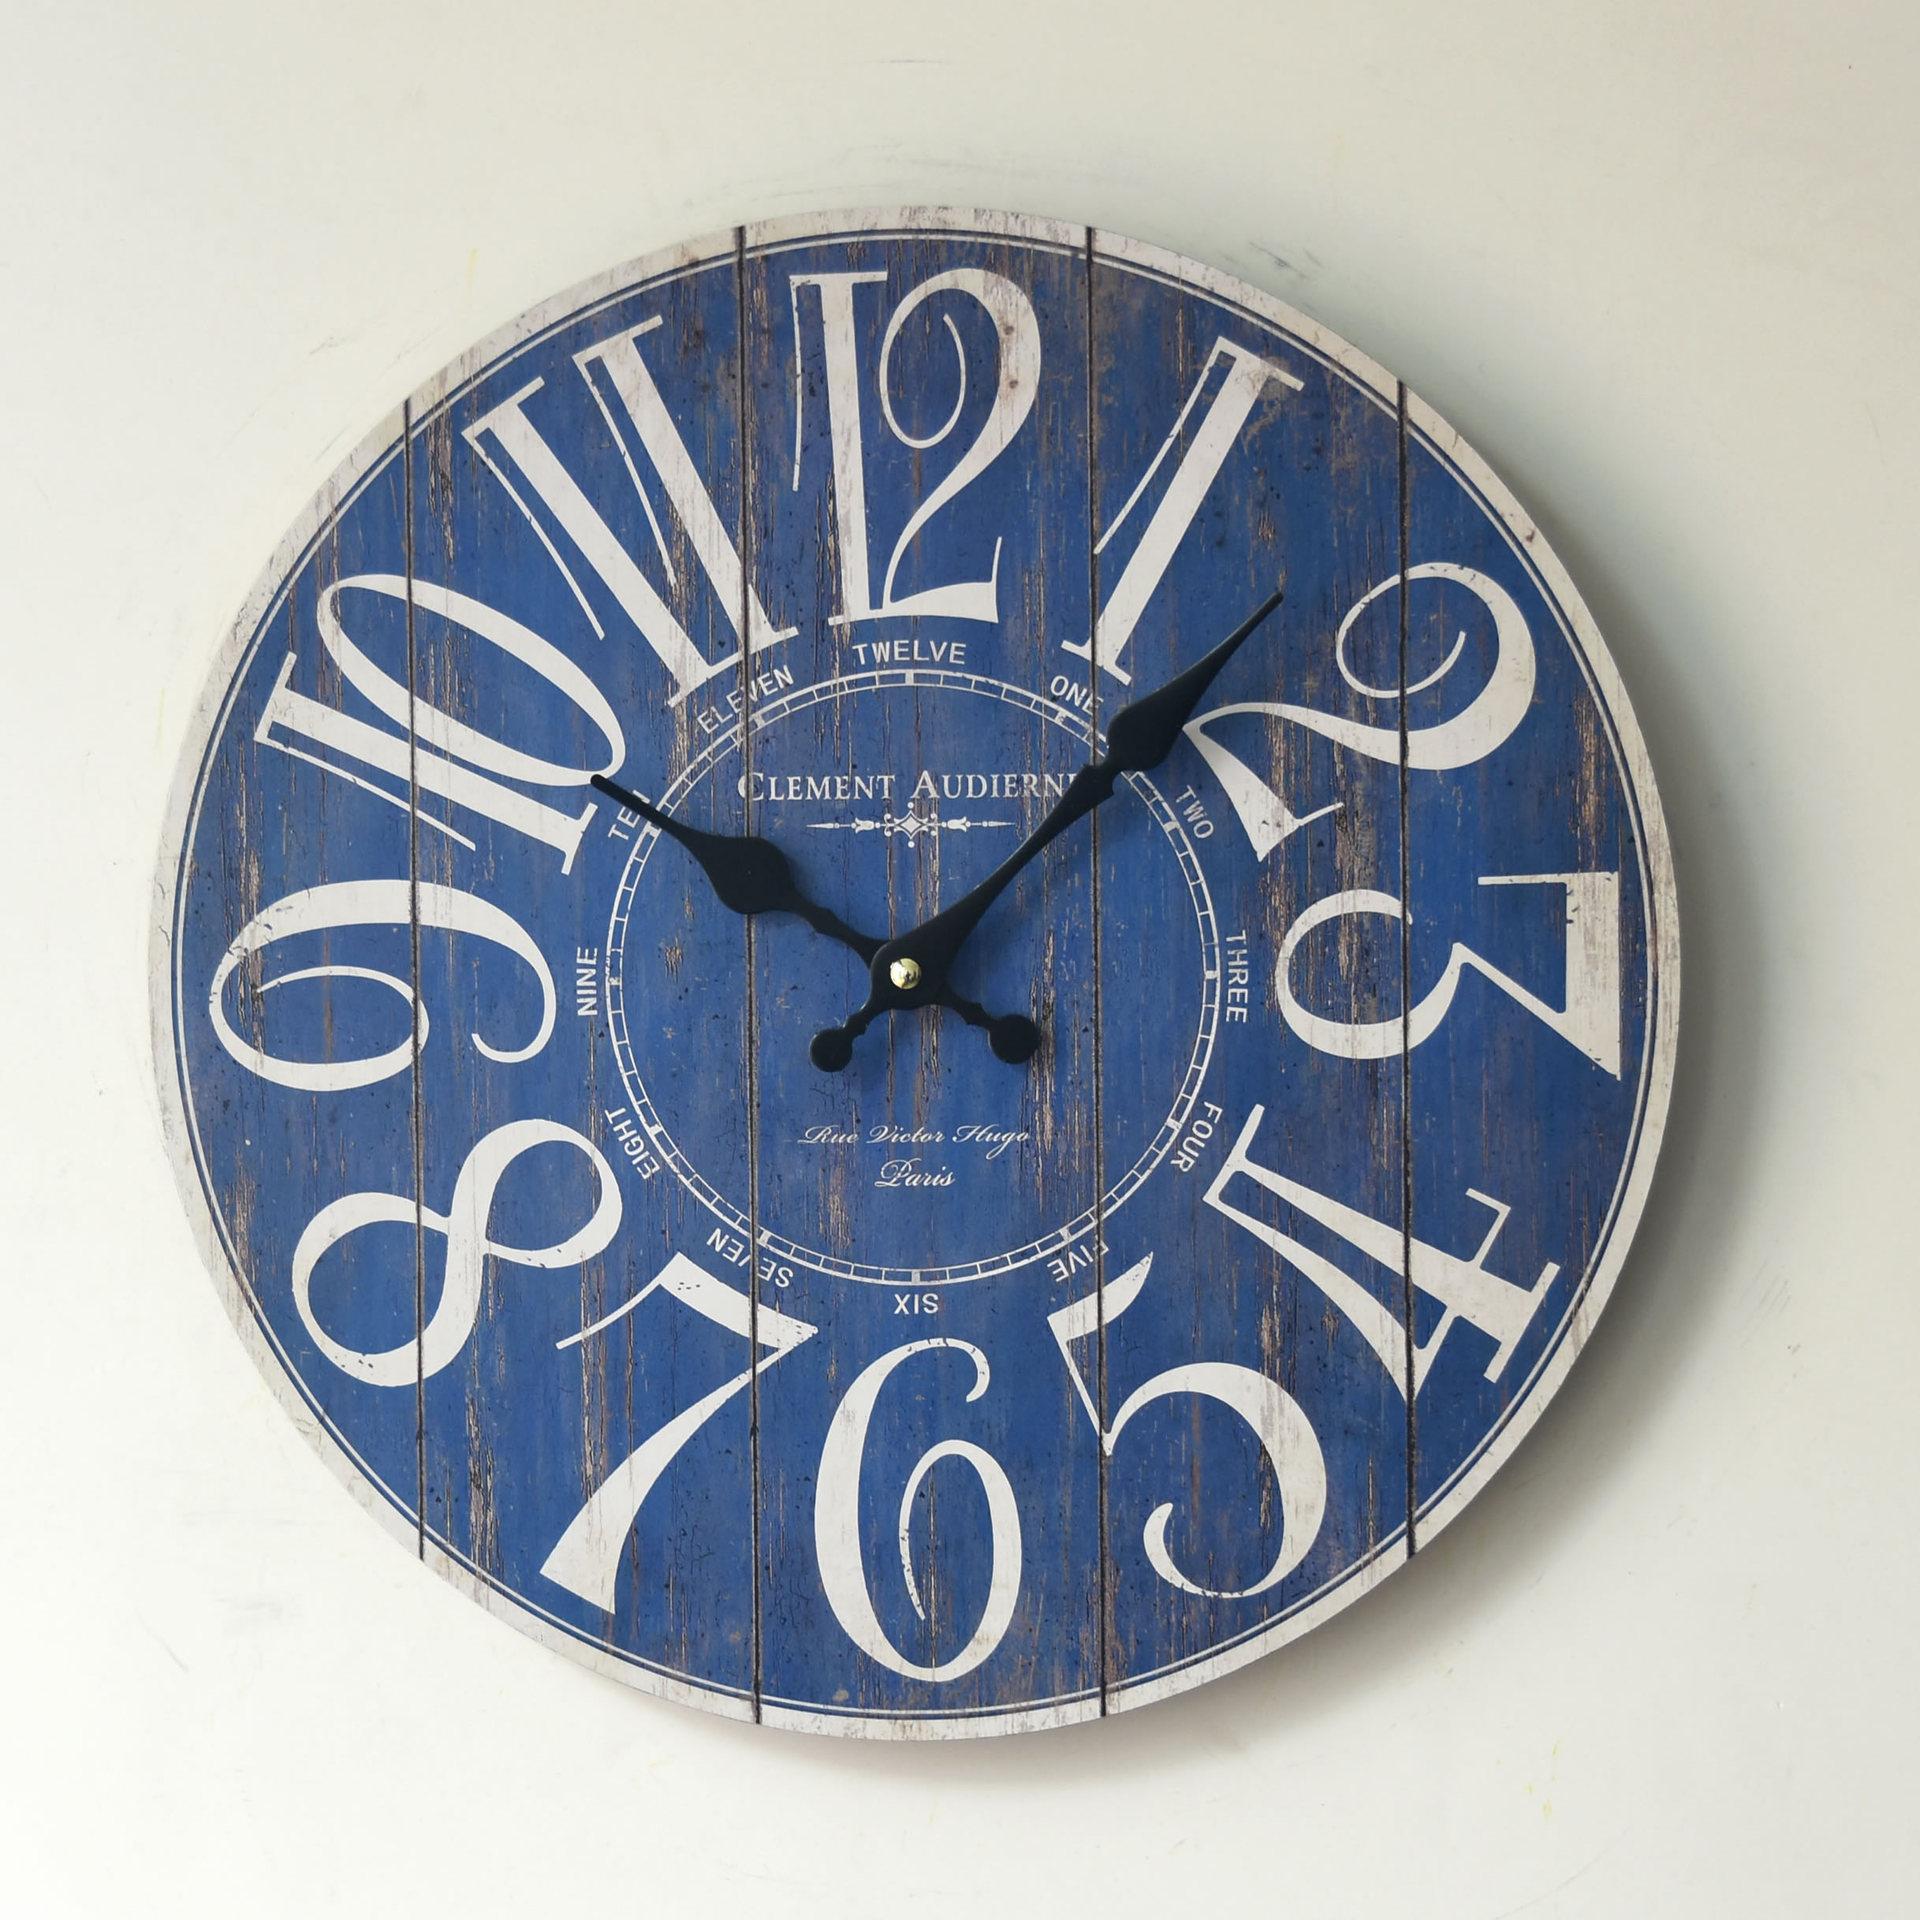 Retro Kitchen Wall Clocks Popular Kitchen Clock Buy Cheap Kitchen Clock Lots From China